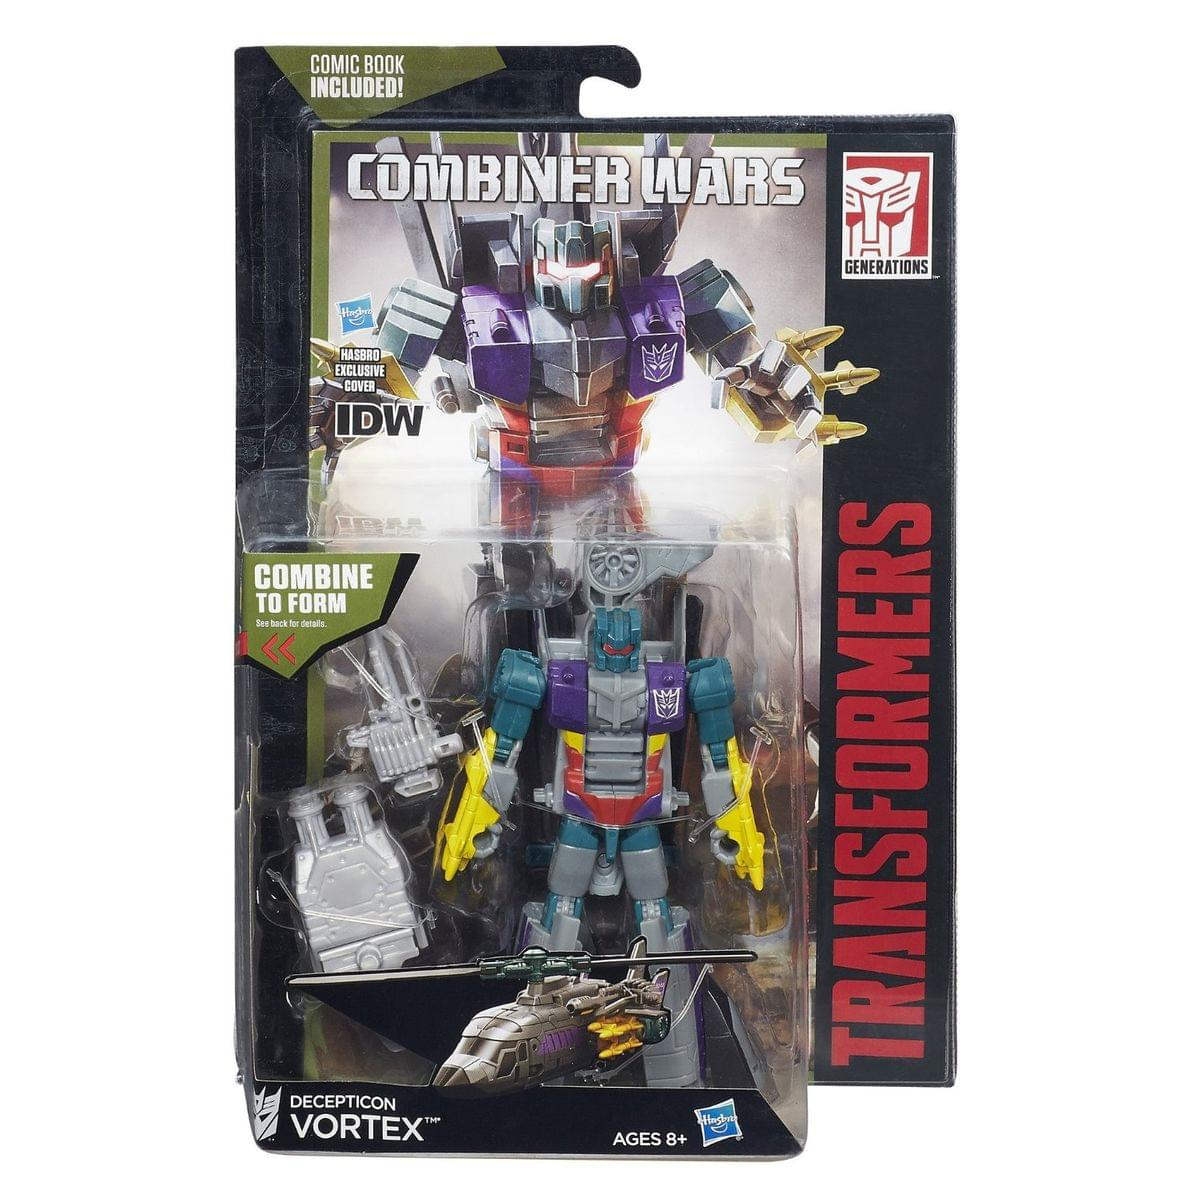 Transformers Generations Combiner Wars Deluxe VORTEX Bruticus NEW FREE SHIPPING